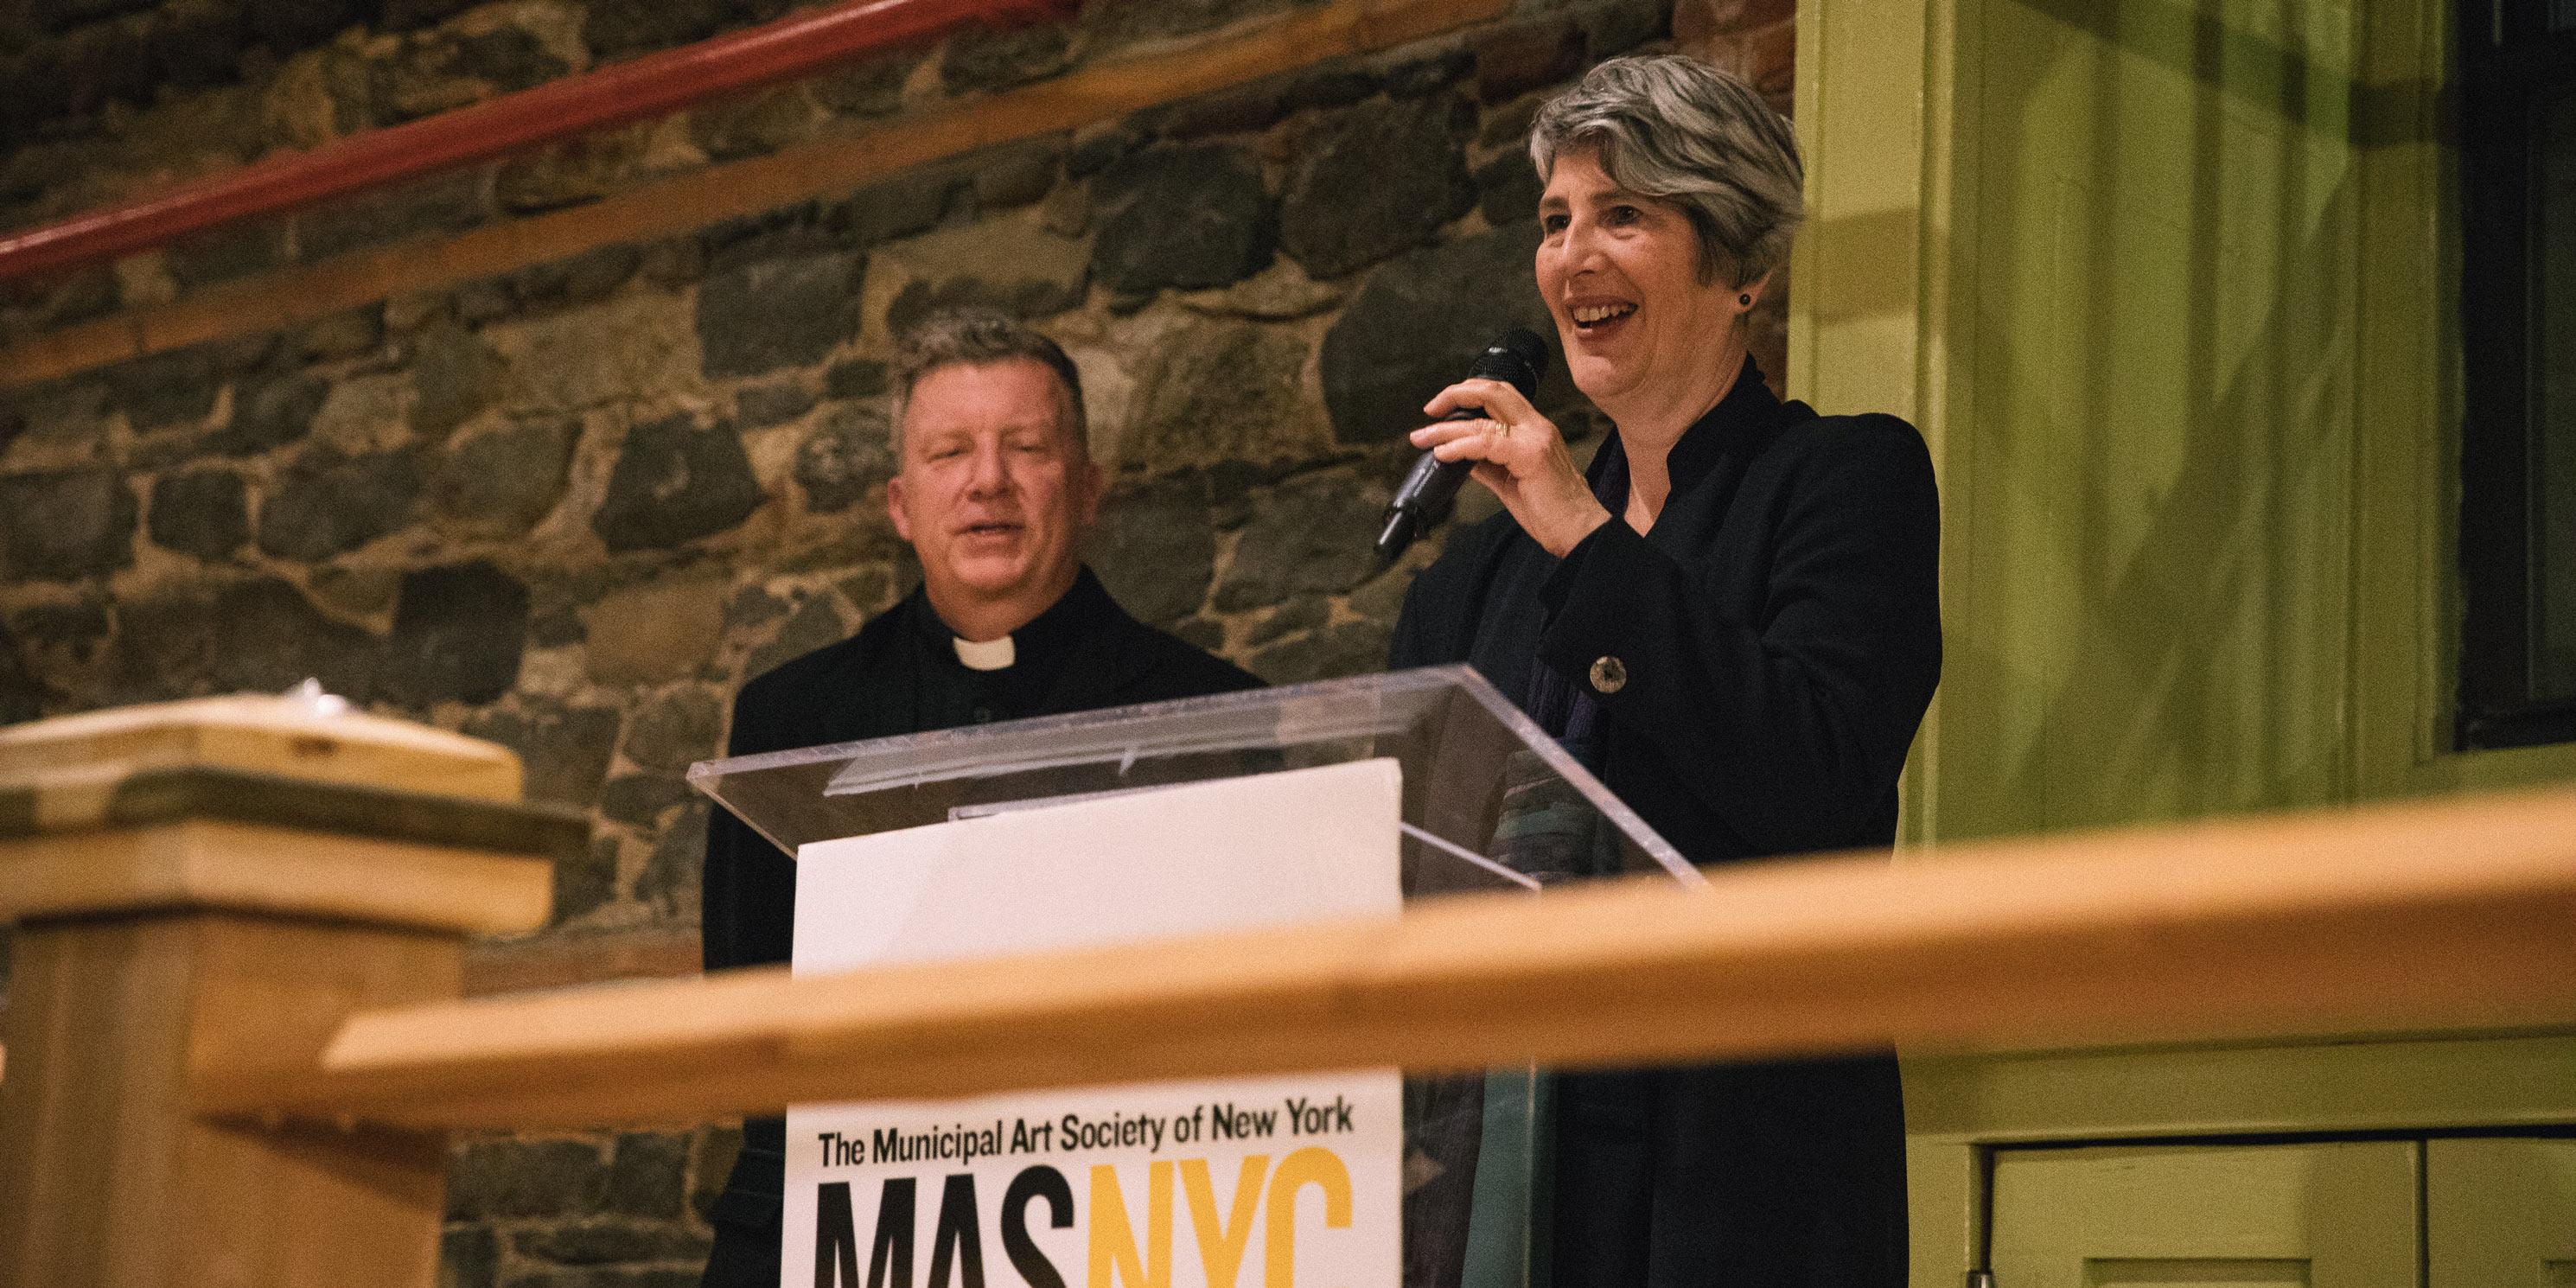 MAS President Elizabeth Goldstein speaks at the Celebrating the City reception